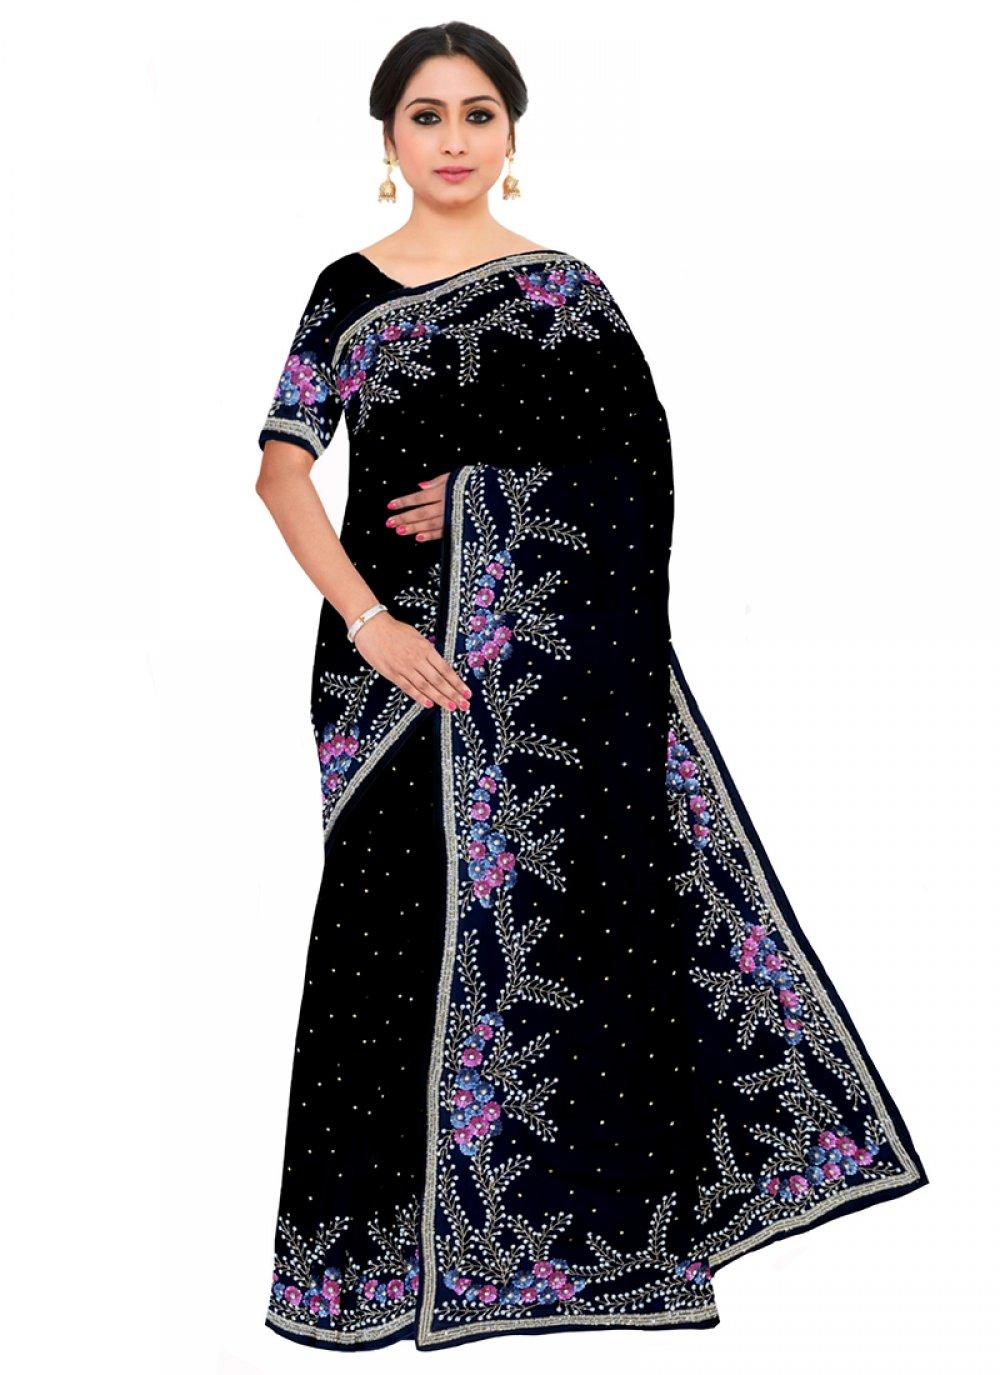 Georgette Embroidered Black Saree